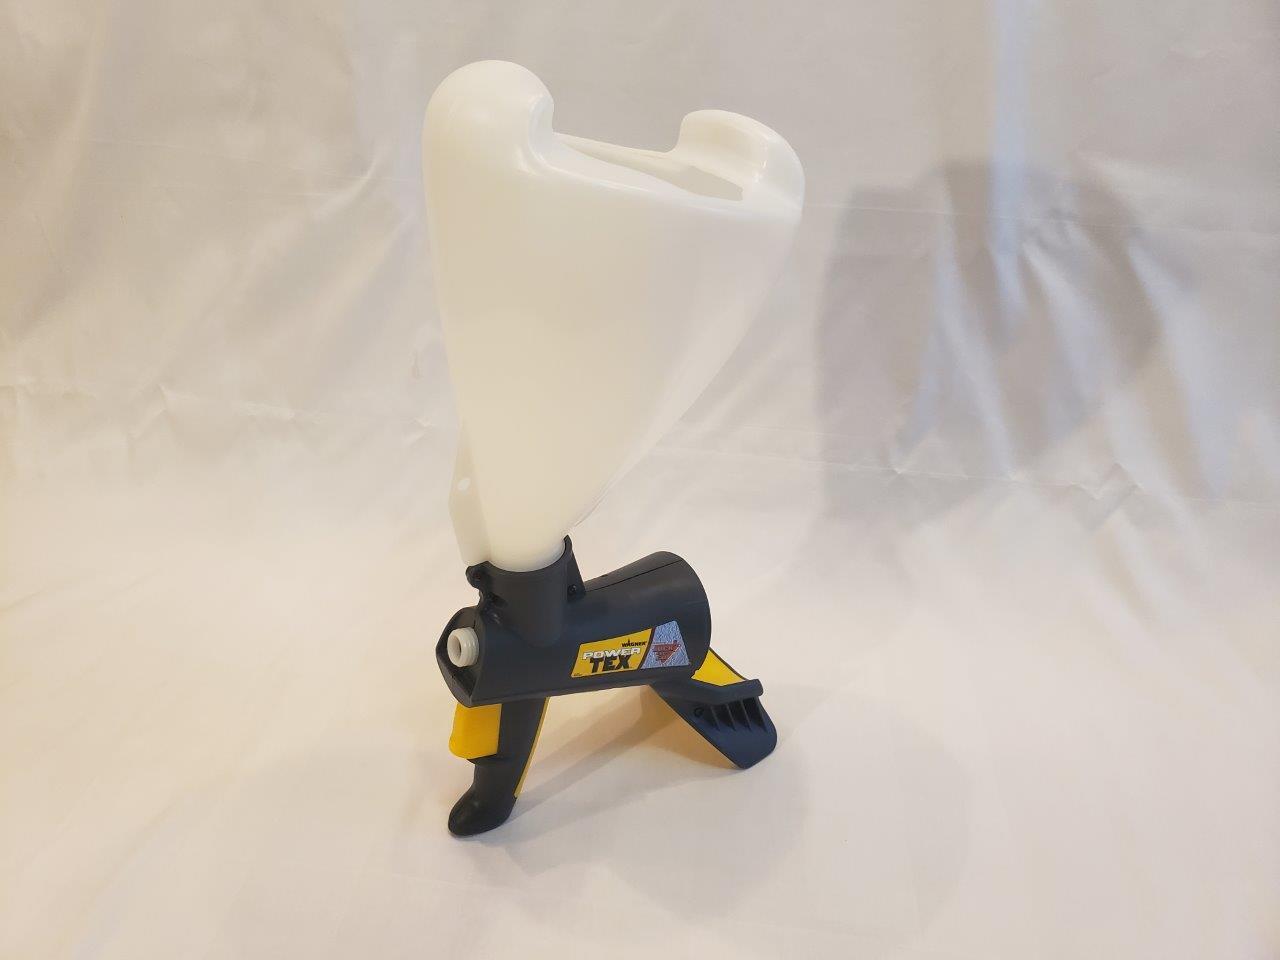 Wagner Power Tex Texture Sprayer 520800 (520000)